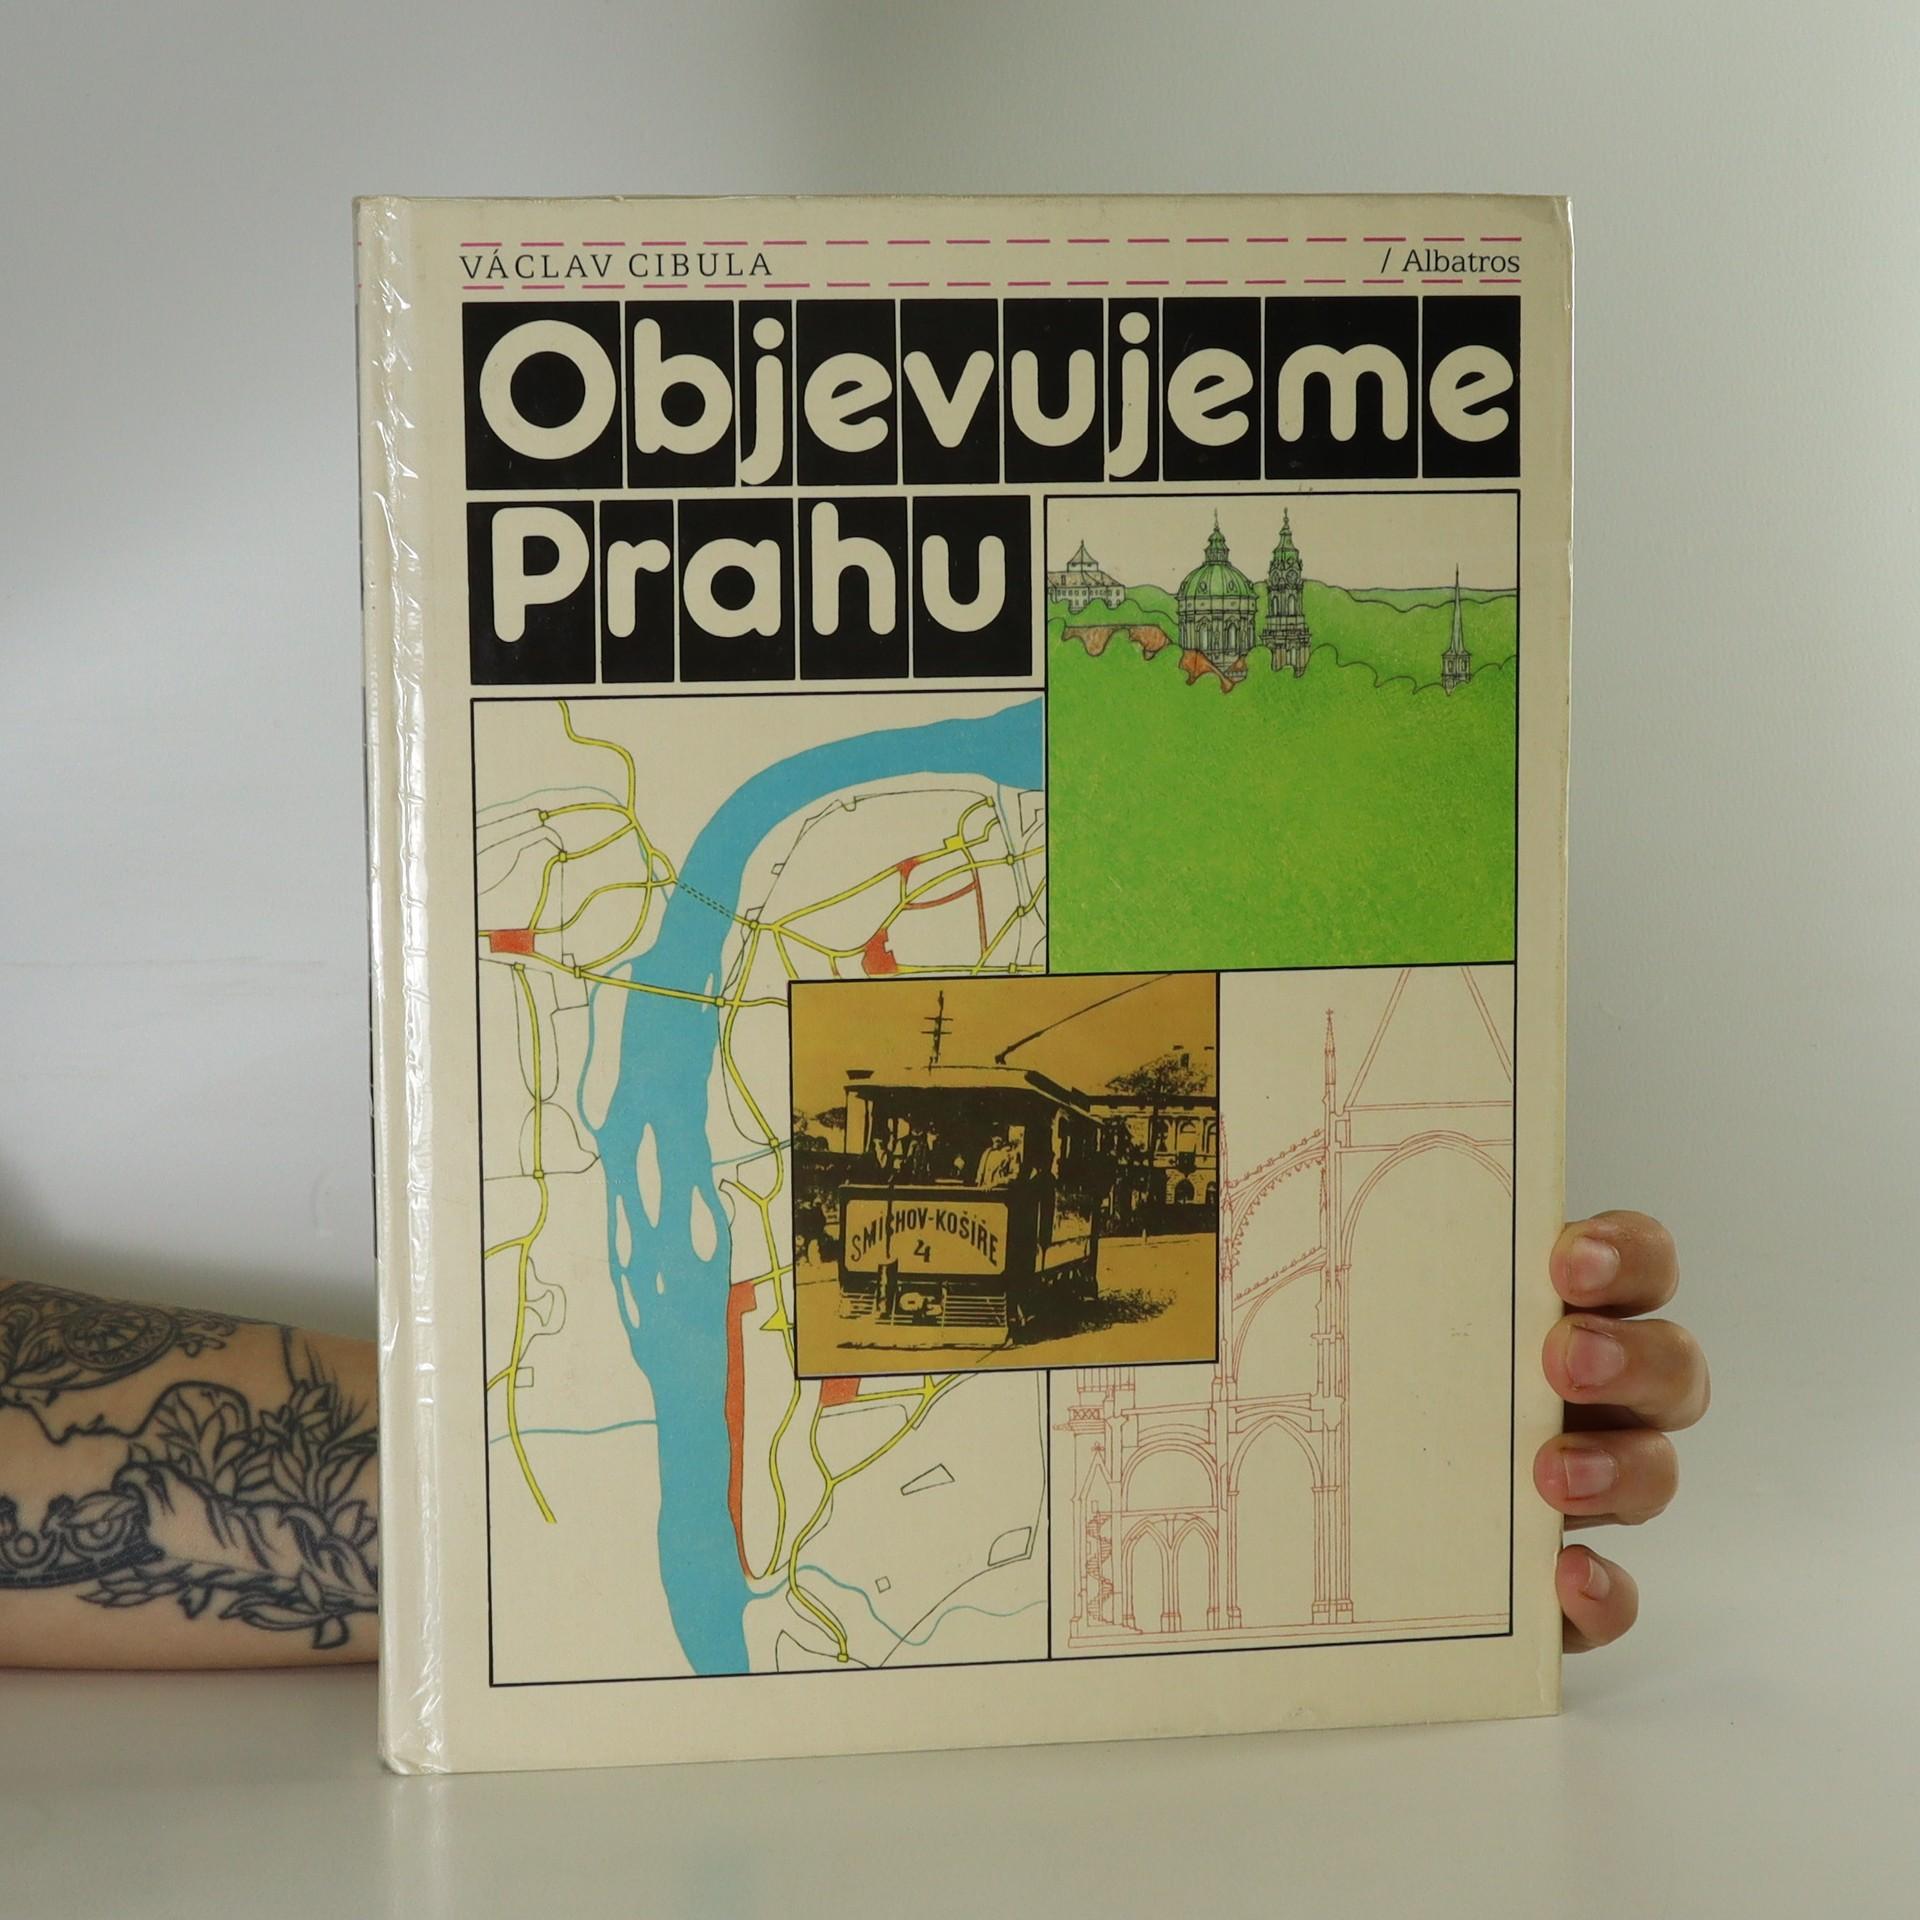 antikvární kniha Objevujeme Prahu, 1988